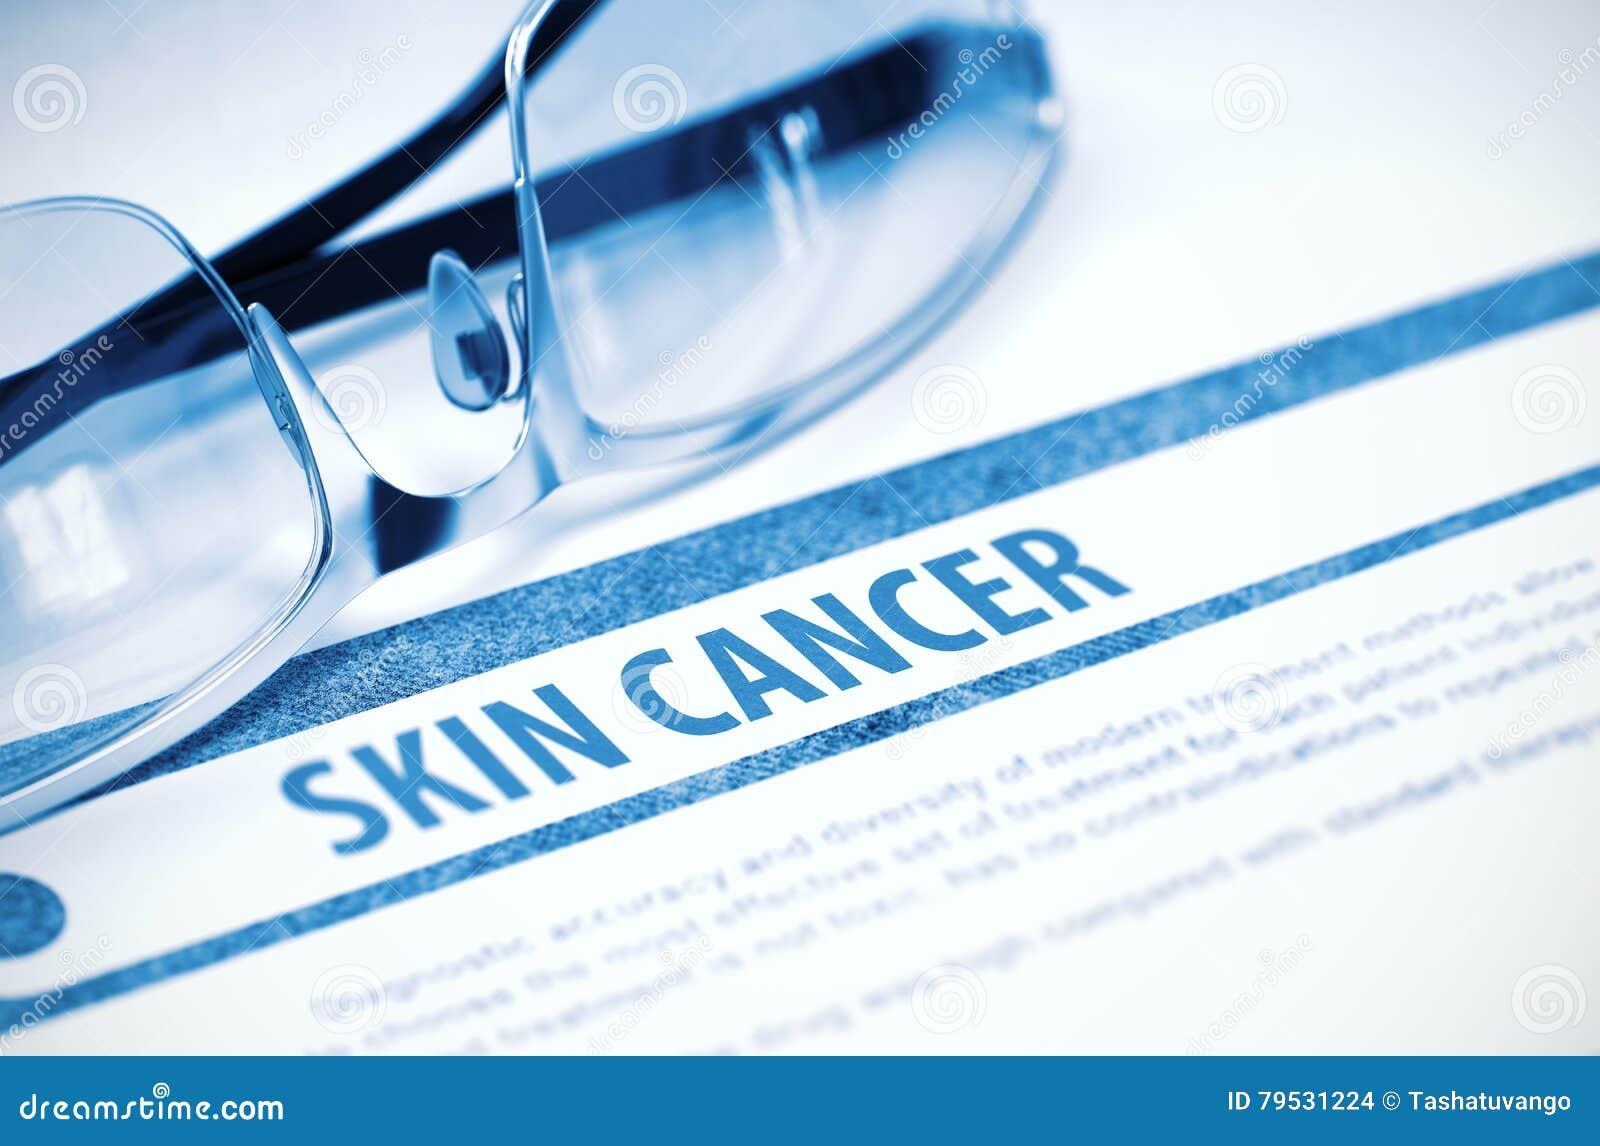 Diagnosis Skin Cancer Medicine Concept 3d Illustration Stock Photo Image Of Rehabilitation Metastasis 79531224